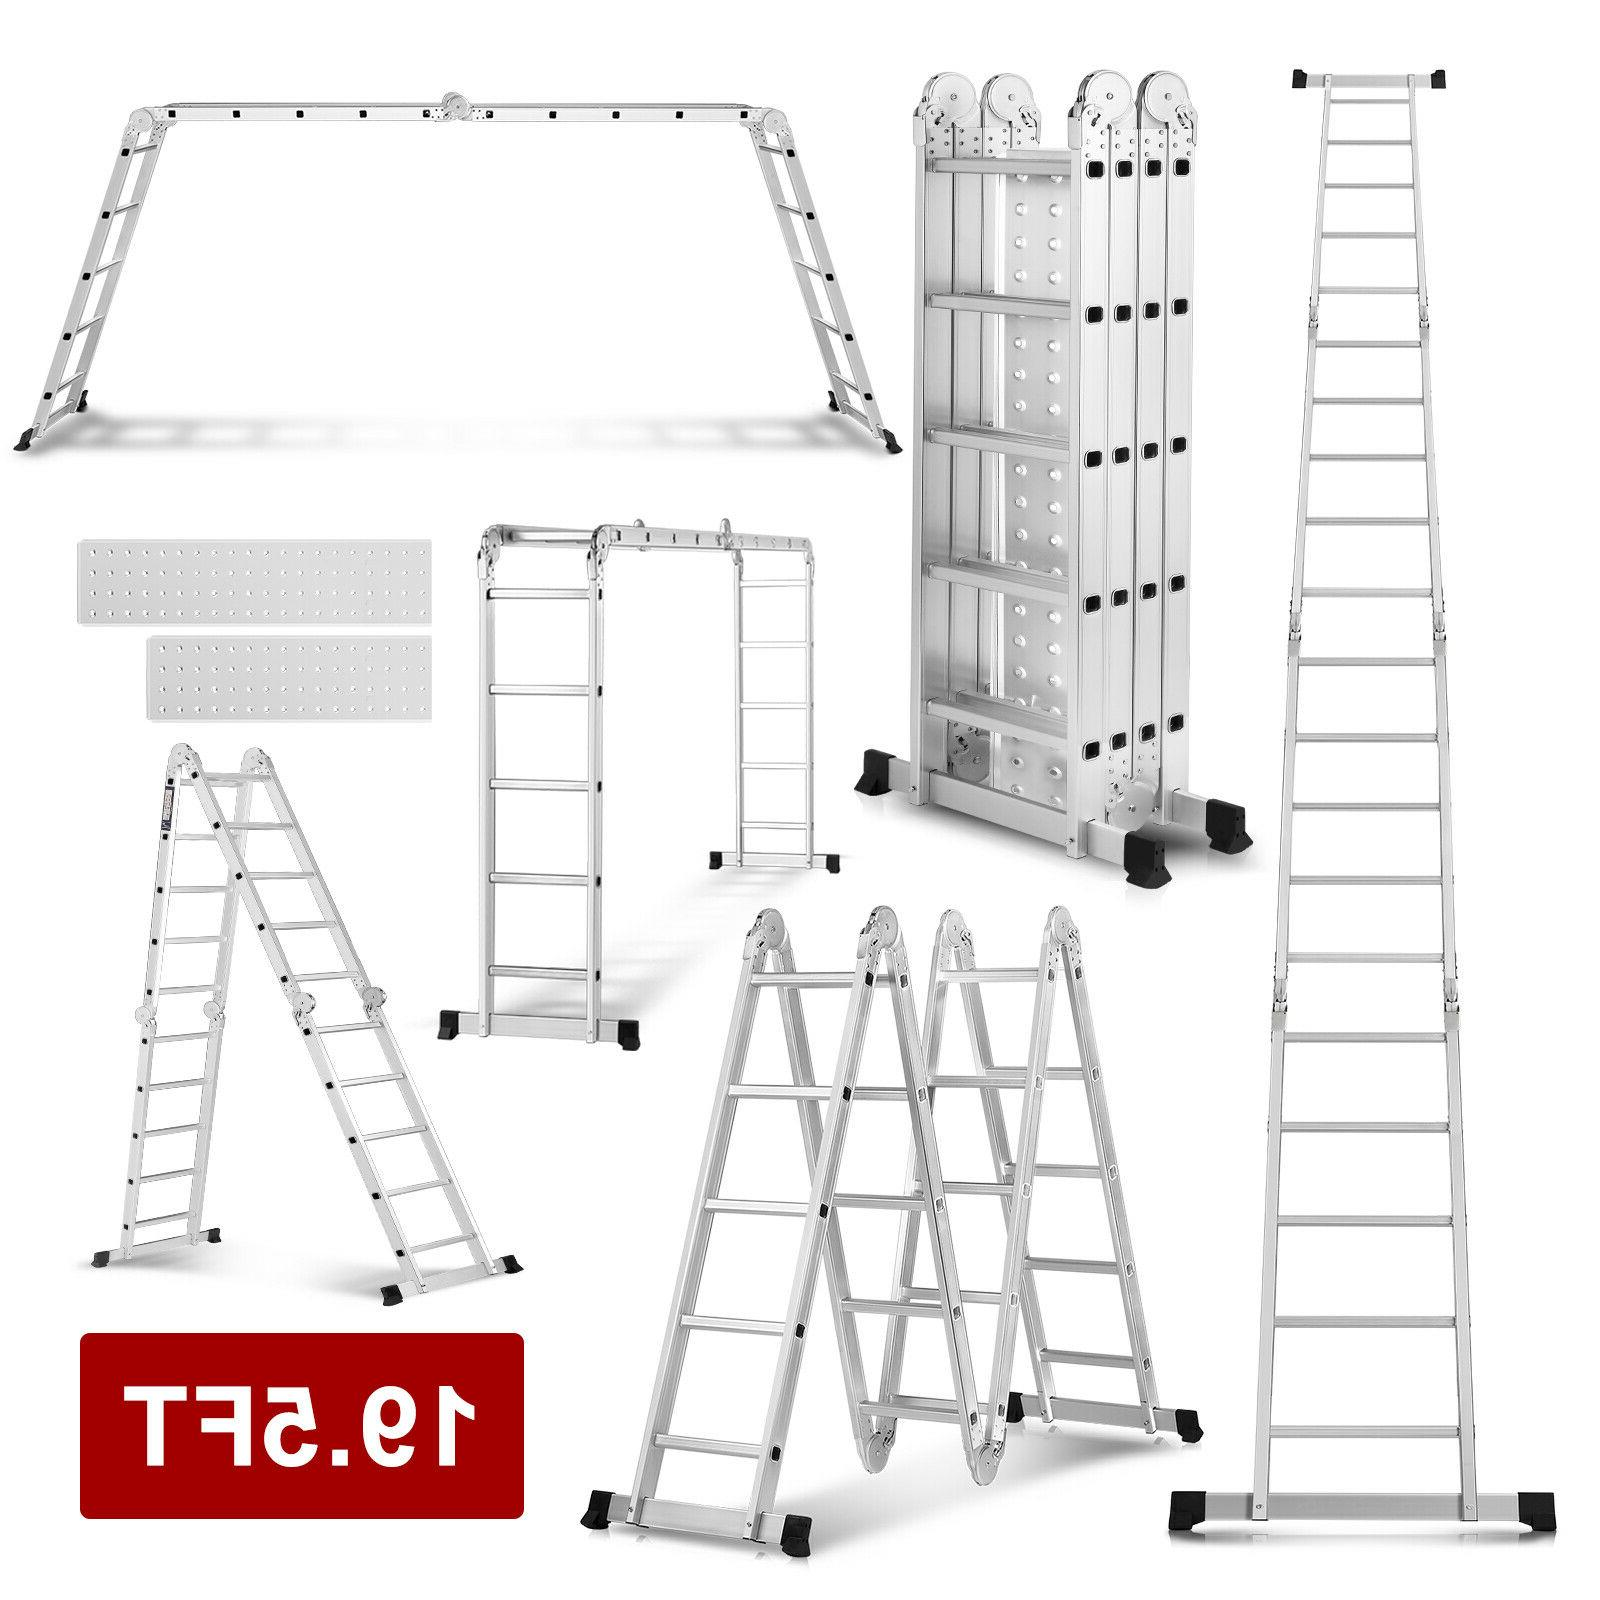 19.5FT Multi Purpose Extension Folding Aluminum Ladder Step